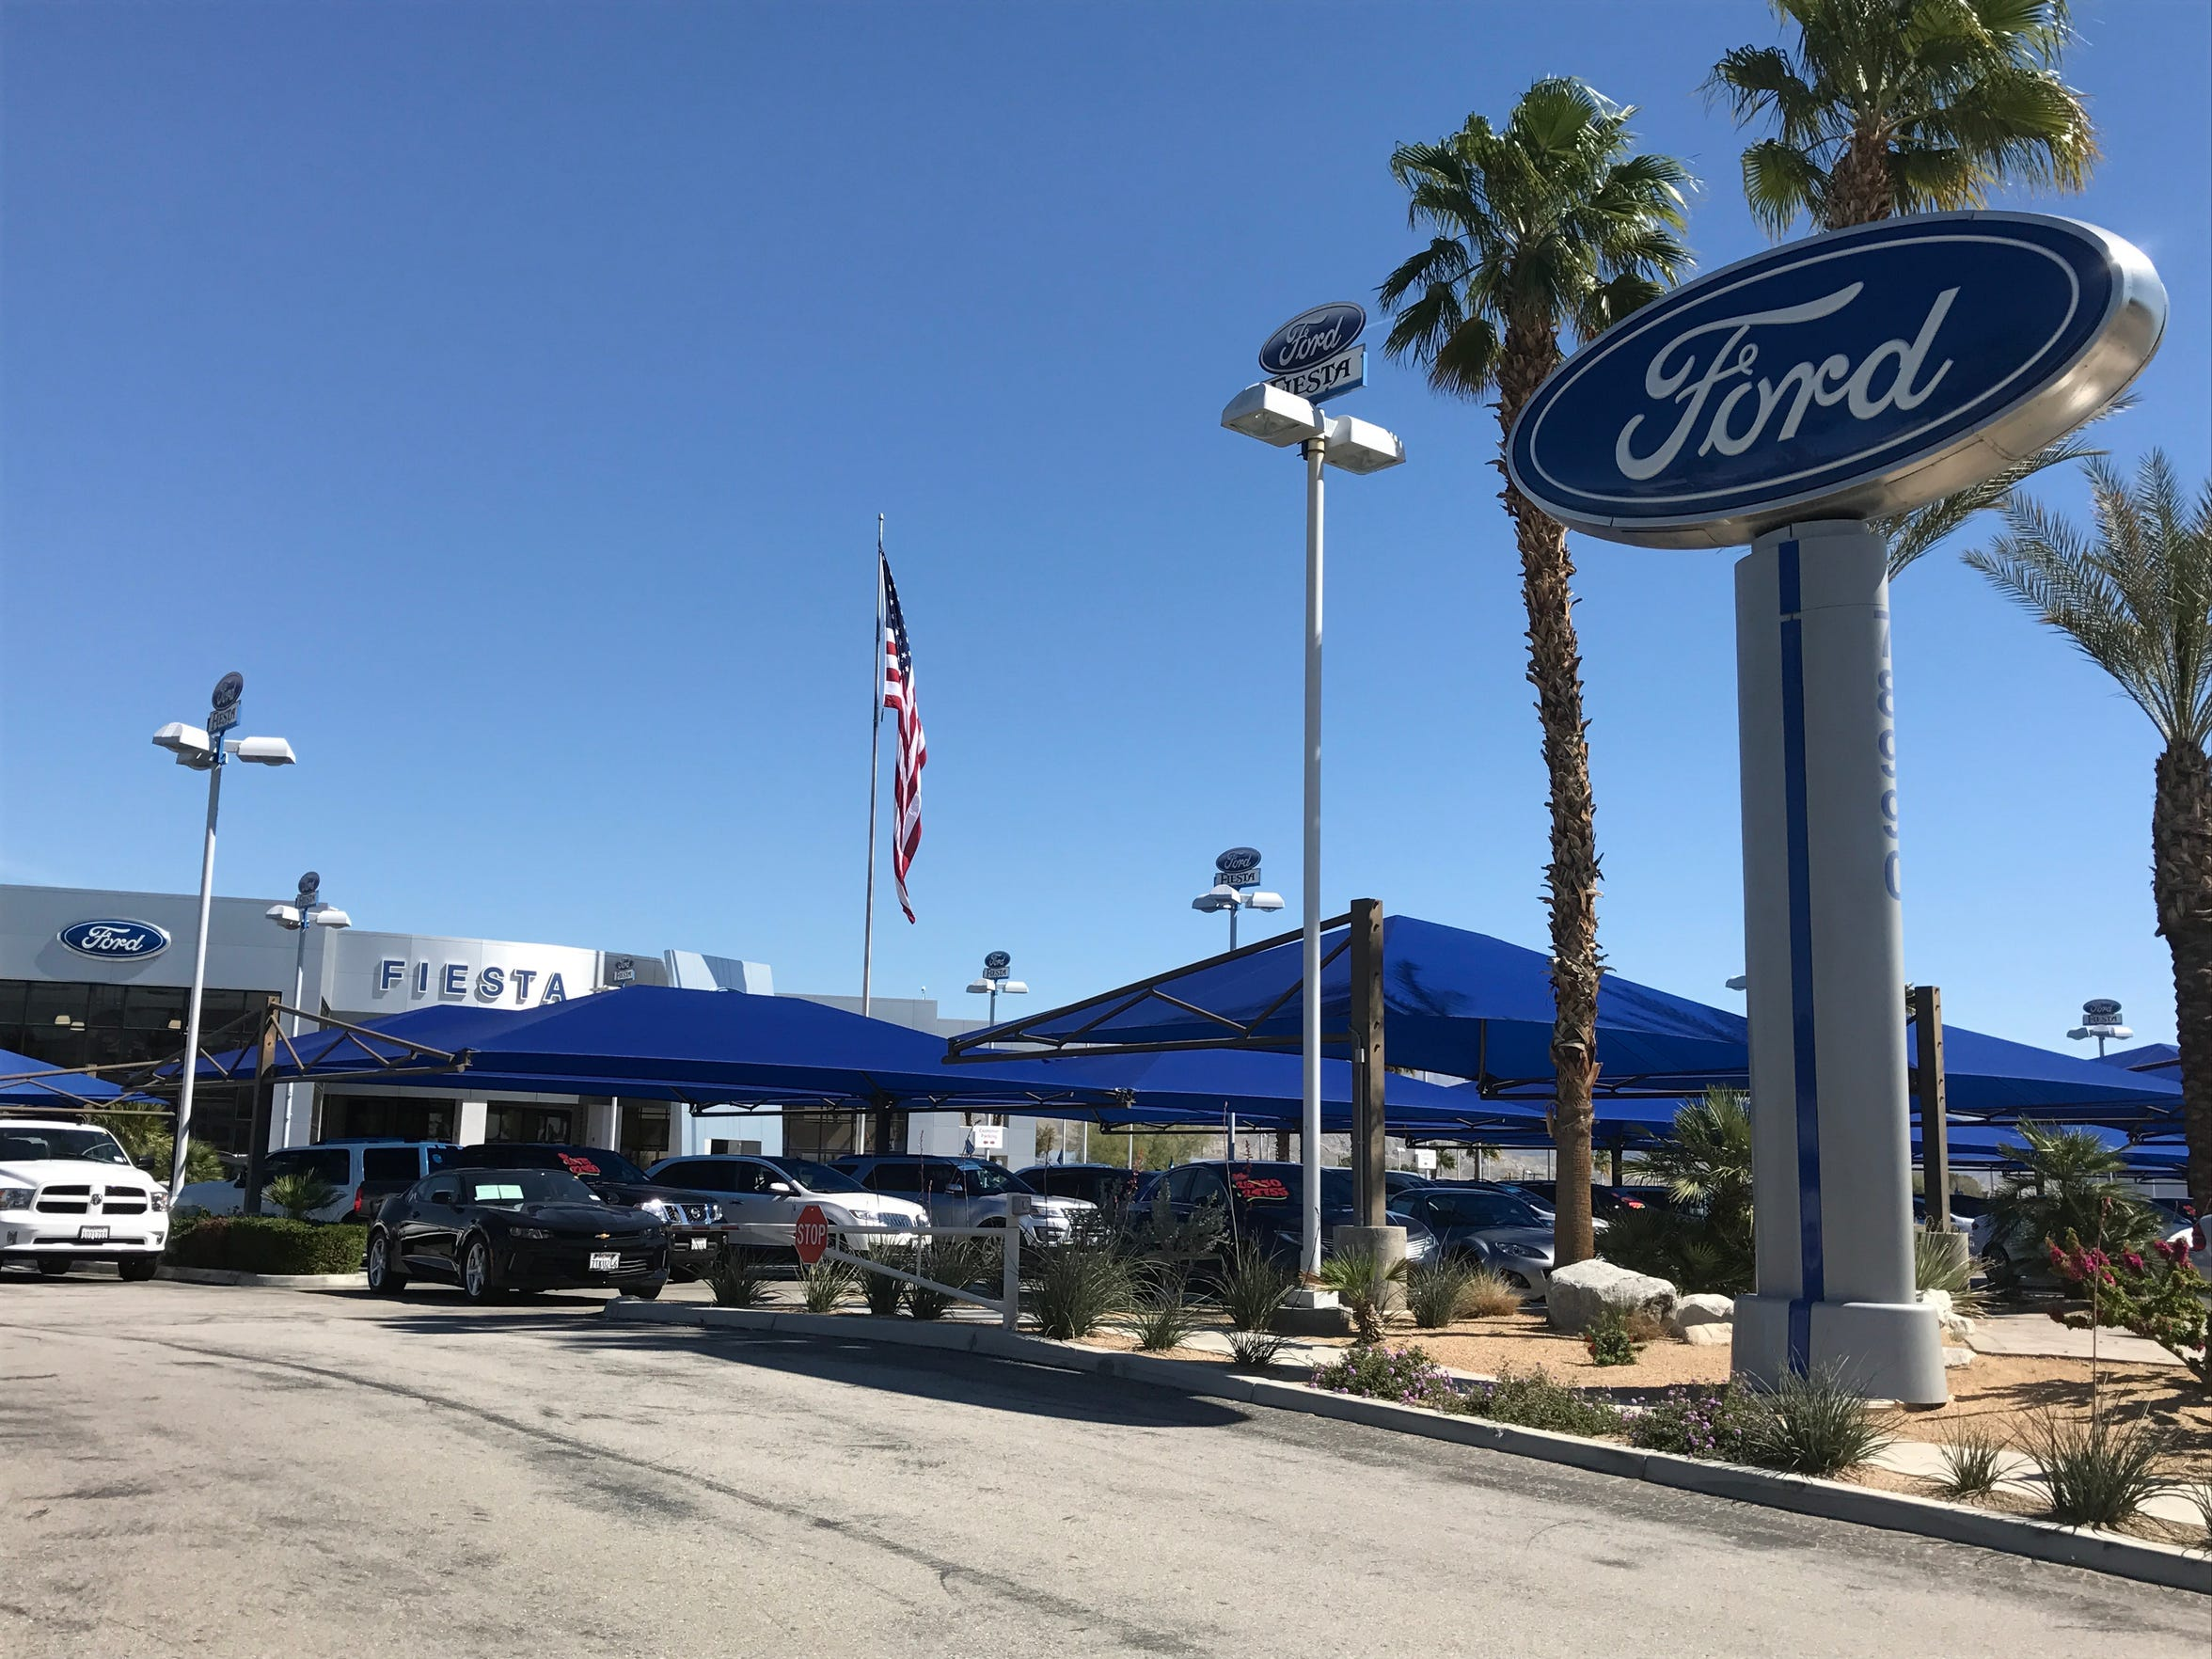 Fiesta Ford.